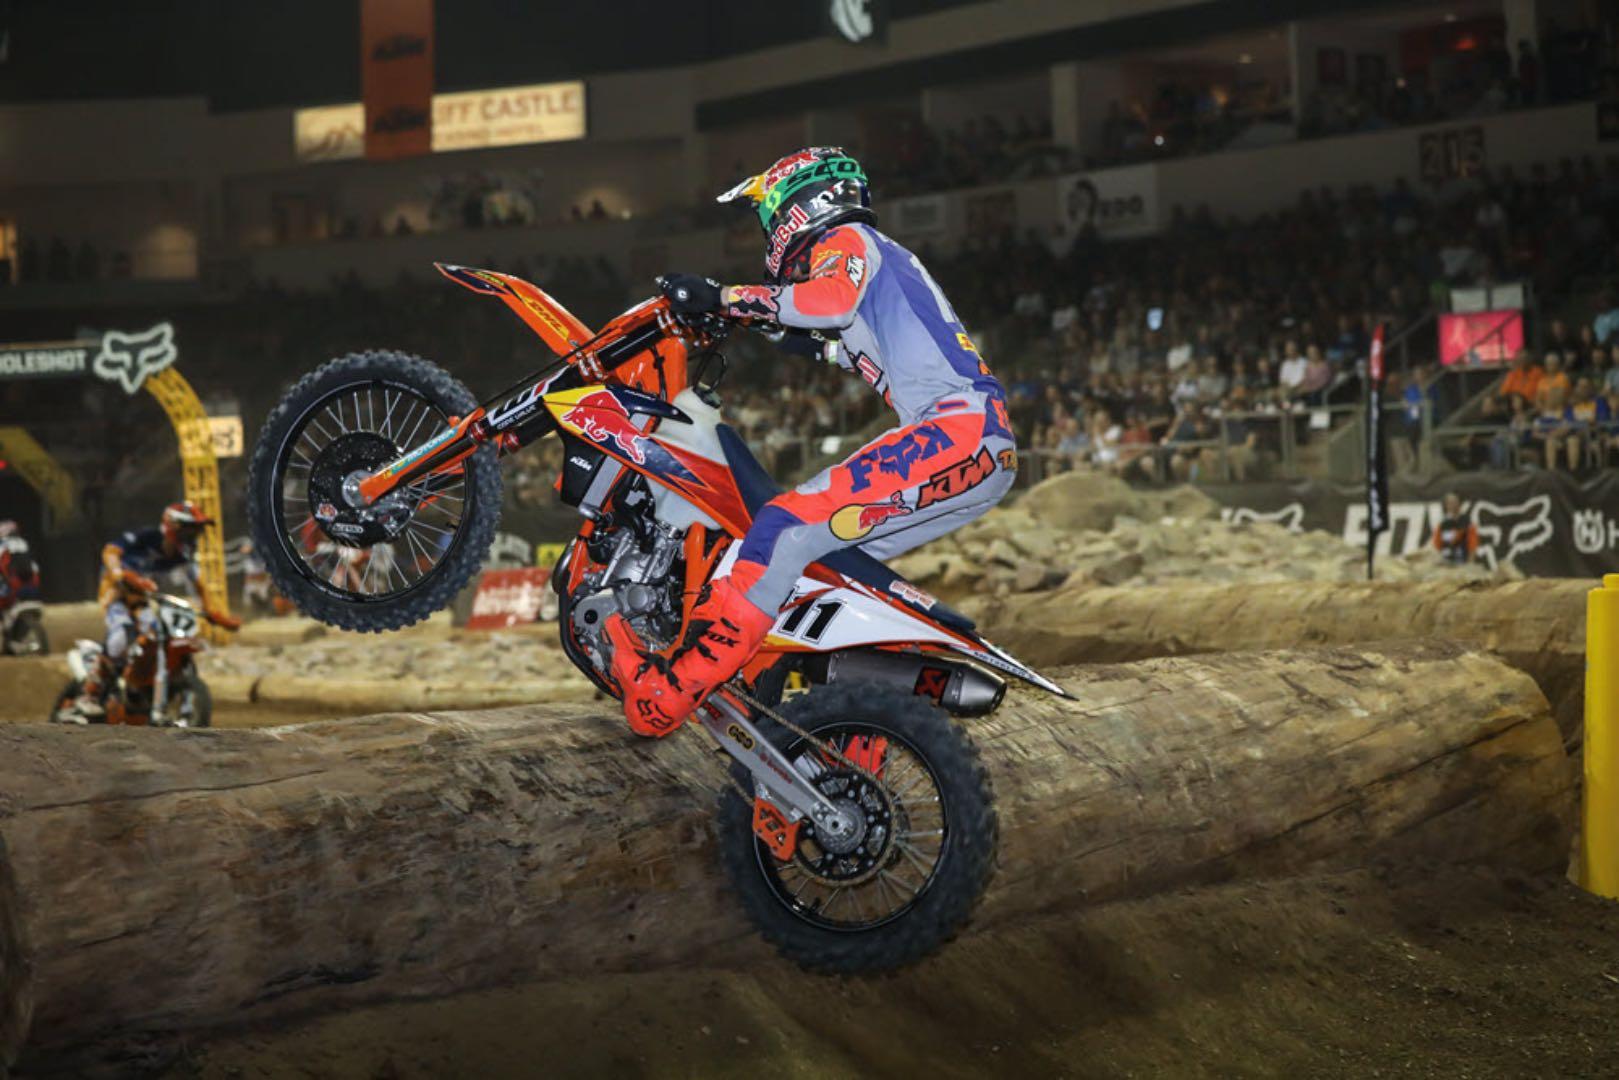 KTM's Taddy Blazusiak at Arizona EnduroCross